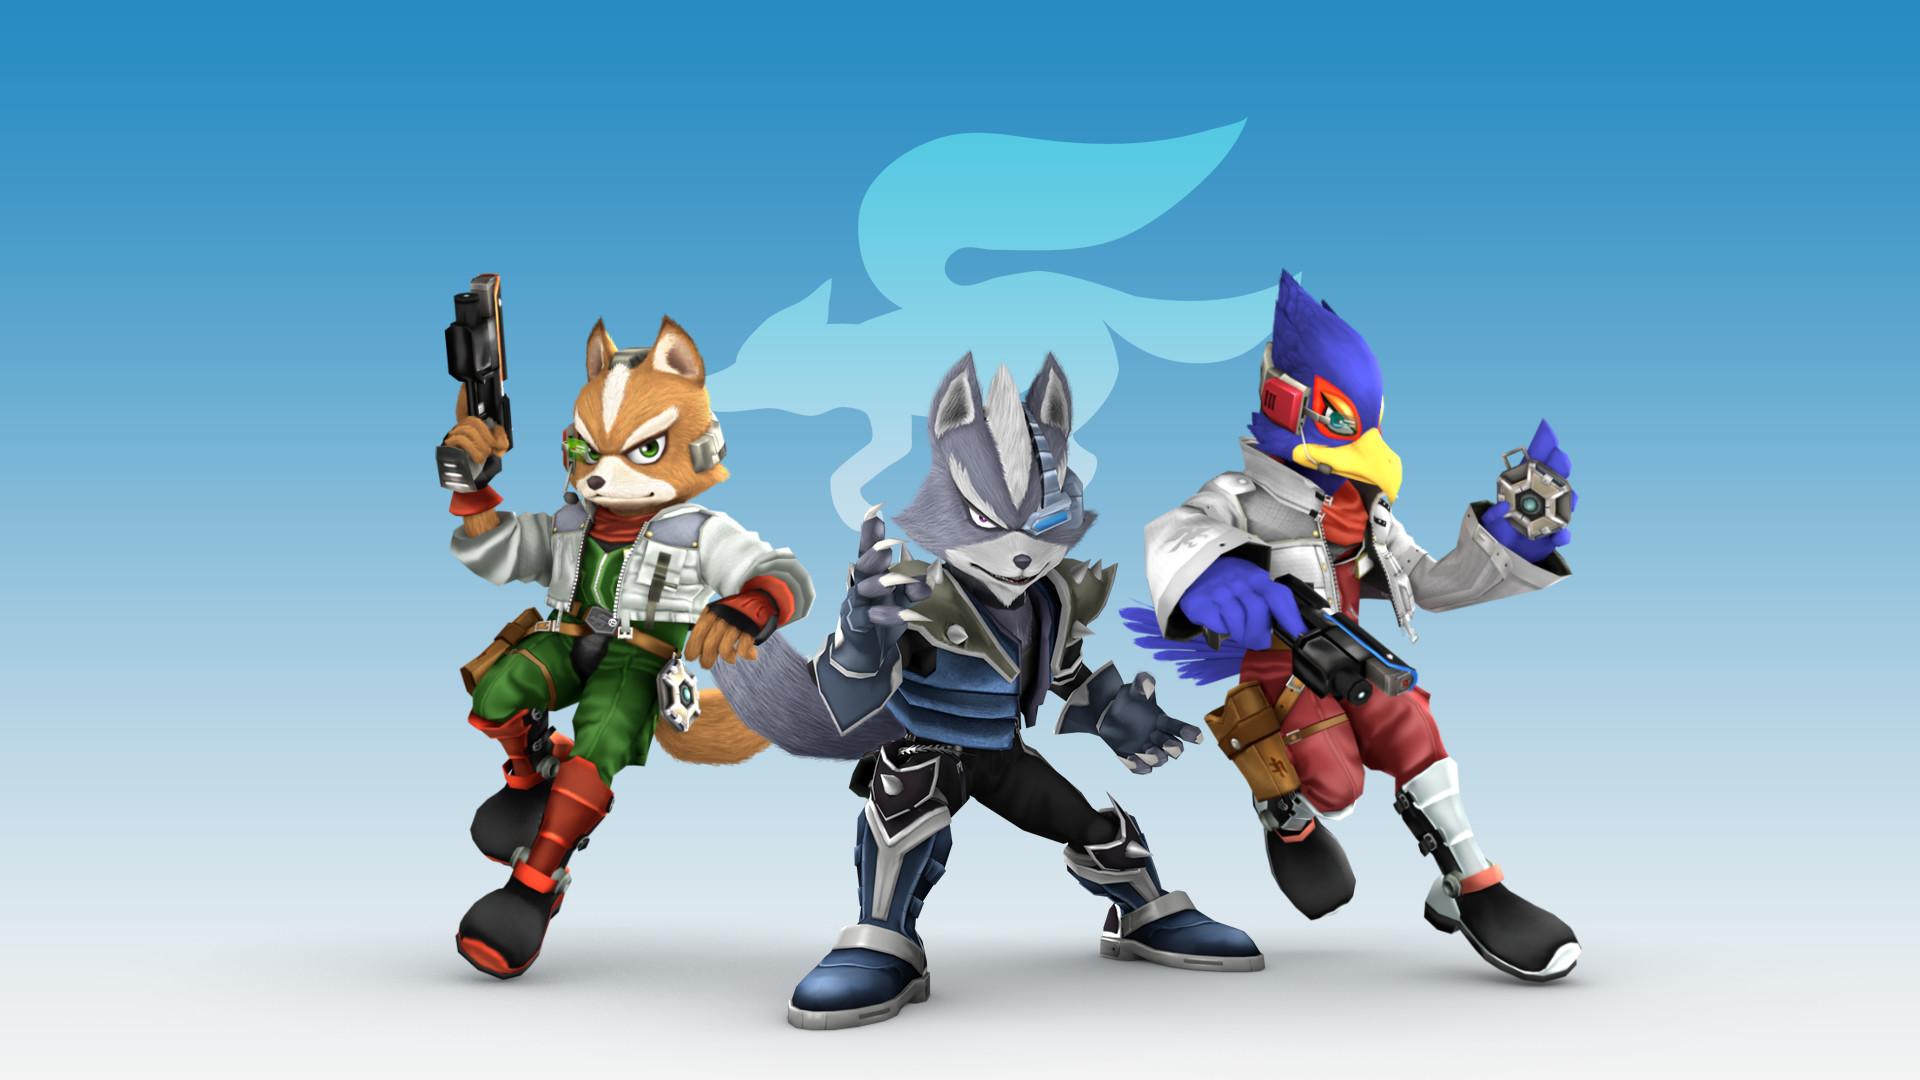 3DS/Wii U – Fox Wallpaper by DaKidGaming on .